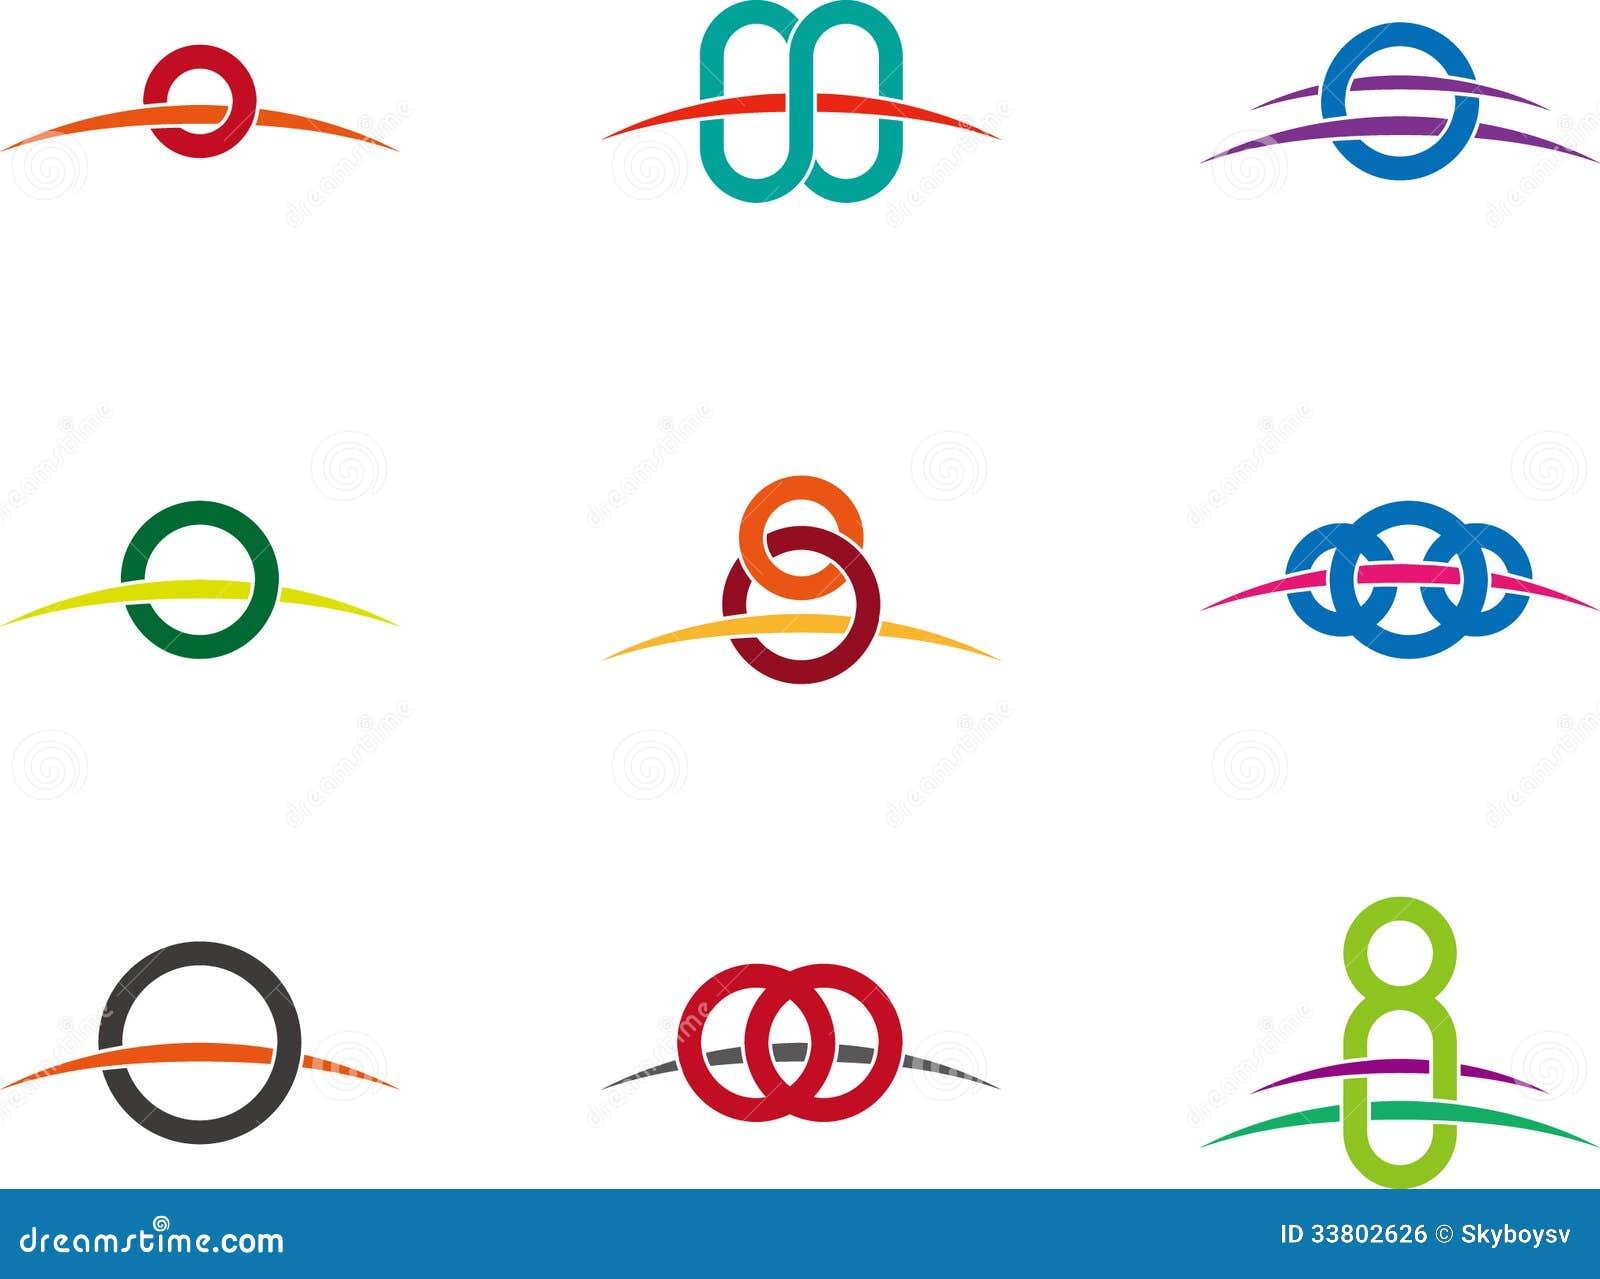 design vector round logo template stock vector image. Black Bedroom Furniture Sets. Home Design Ideas